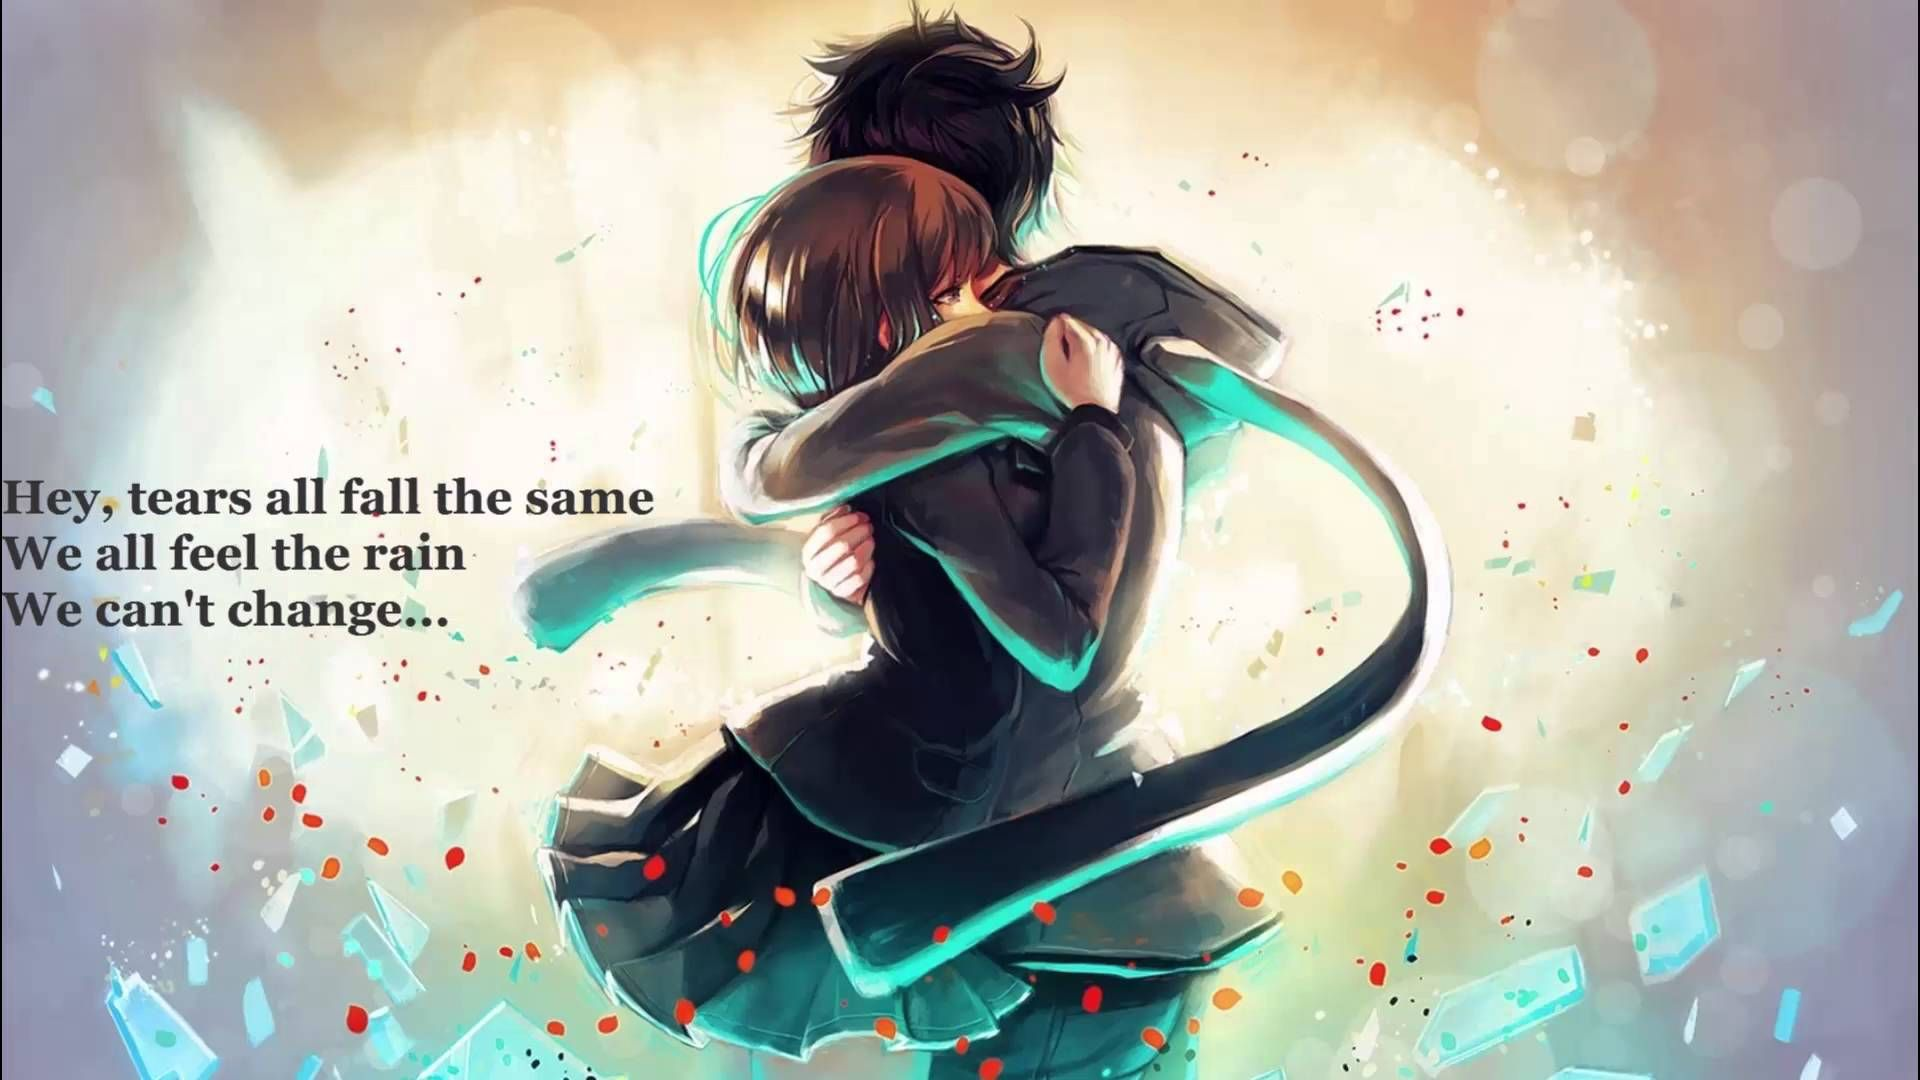 Nightcore Outlaws Of Love Lyrics Anime Hug Romantic Anime Hd Anime Wallpapers